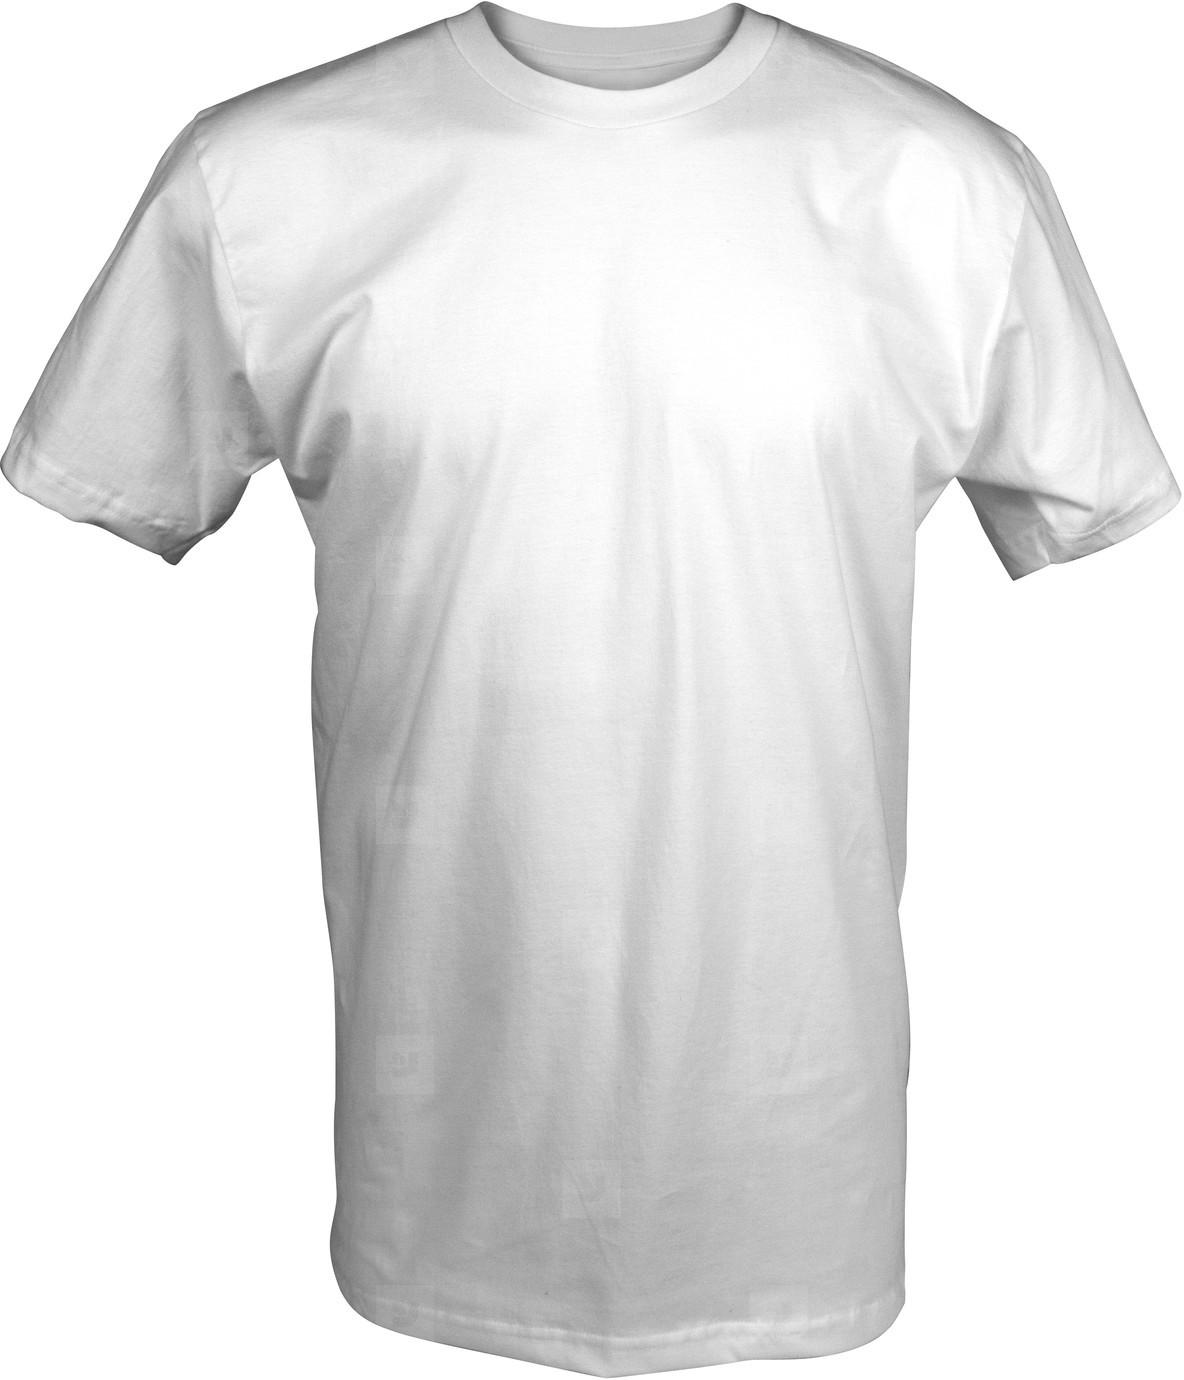 3e9d42ff1 T Shirt Designing Photoshop - DREAMWORKS